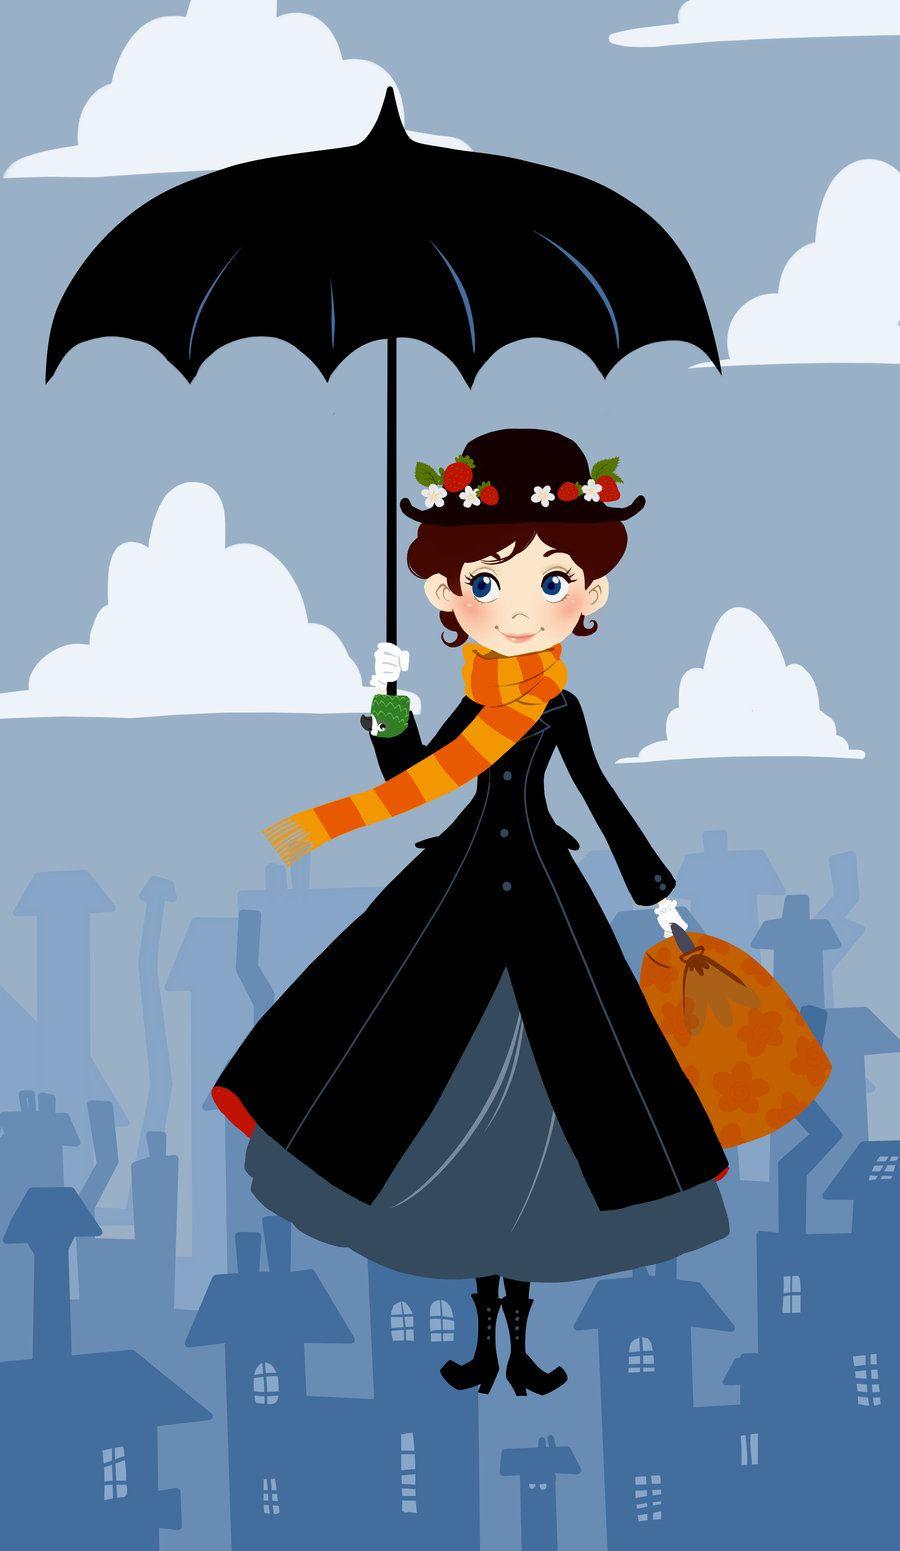 e991070c0 El blog de Pastelito  Retrospectiva de Mary Poppins